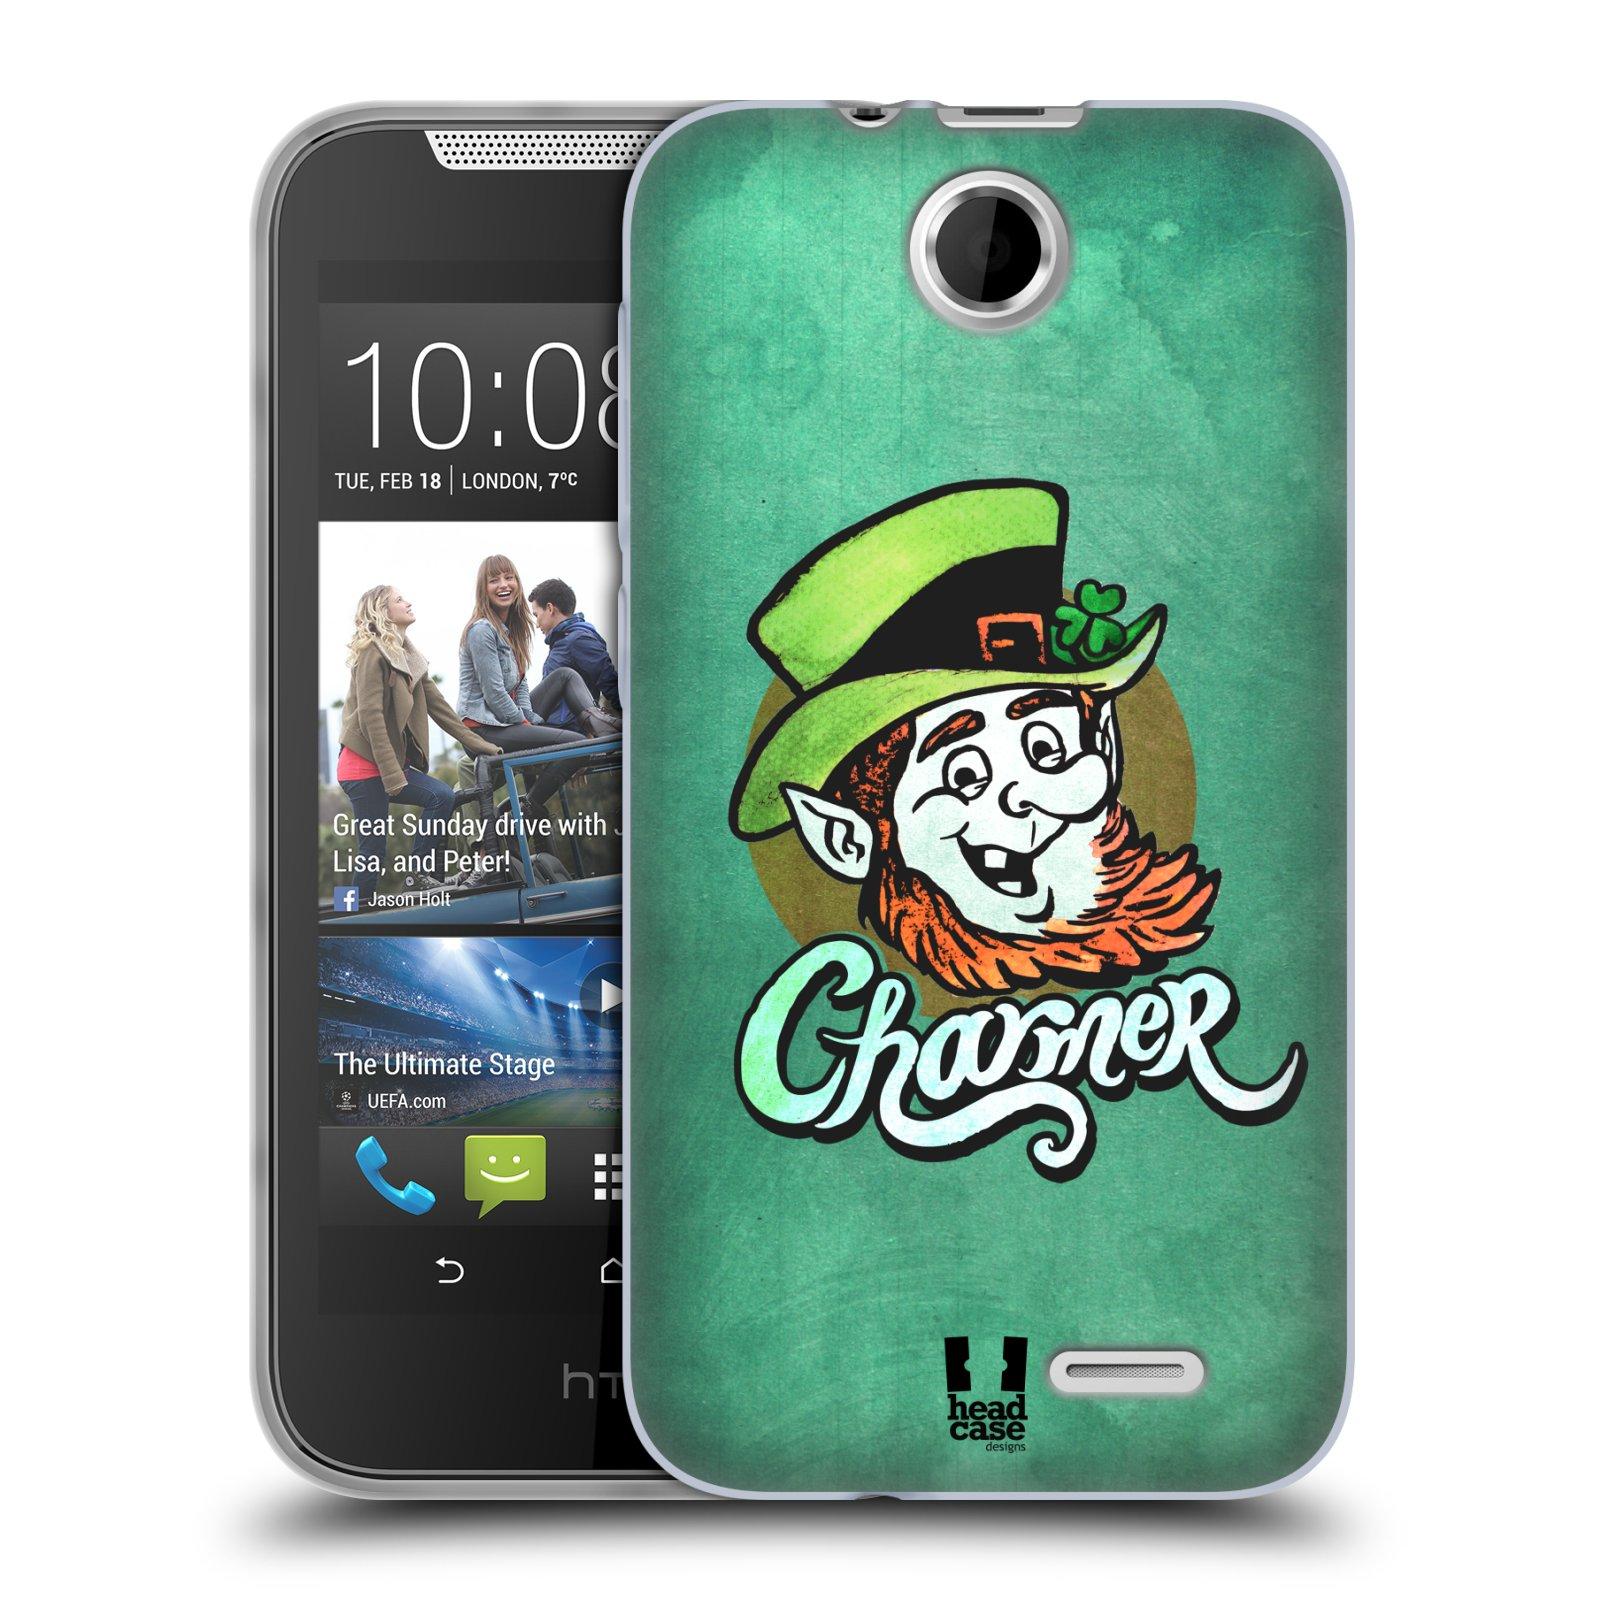 Silikonové pouzdro na mobil HTC Desire 310 HEAD CASE CHARMER (Silikonový kryt či obal na mobilní telefon HTC Desire 310)